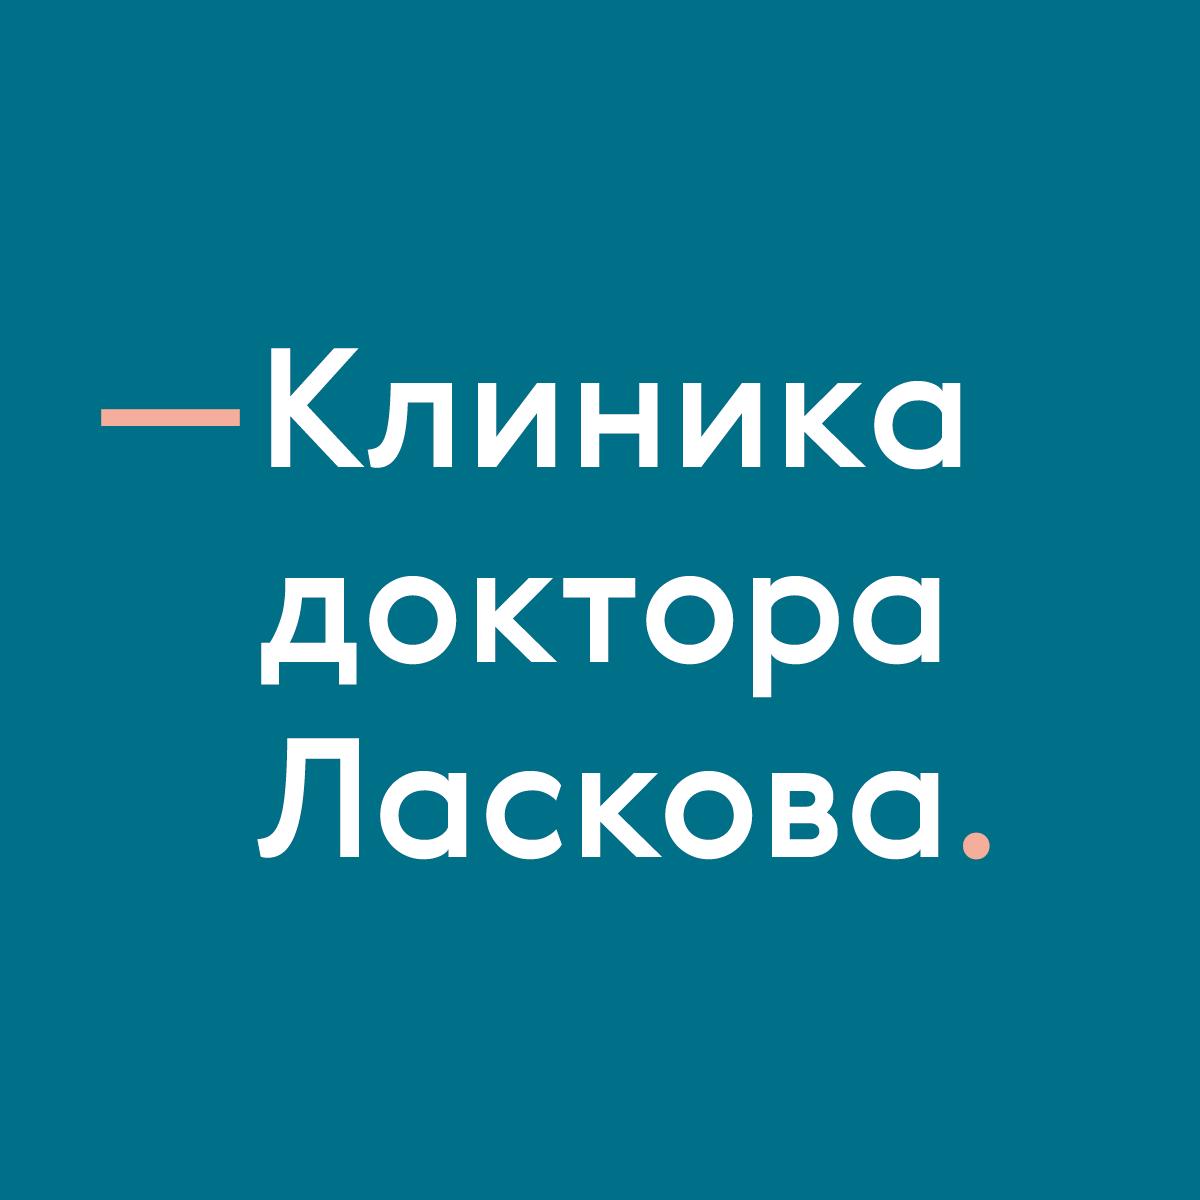 Клиника доктора Ласкова